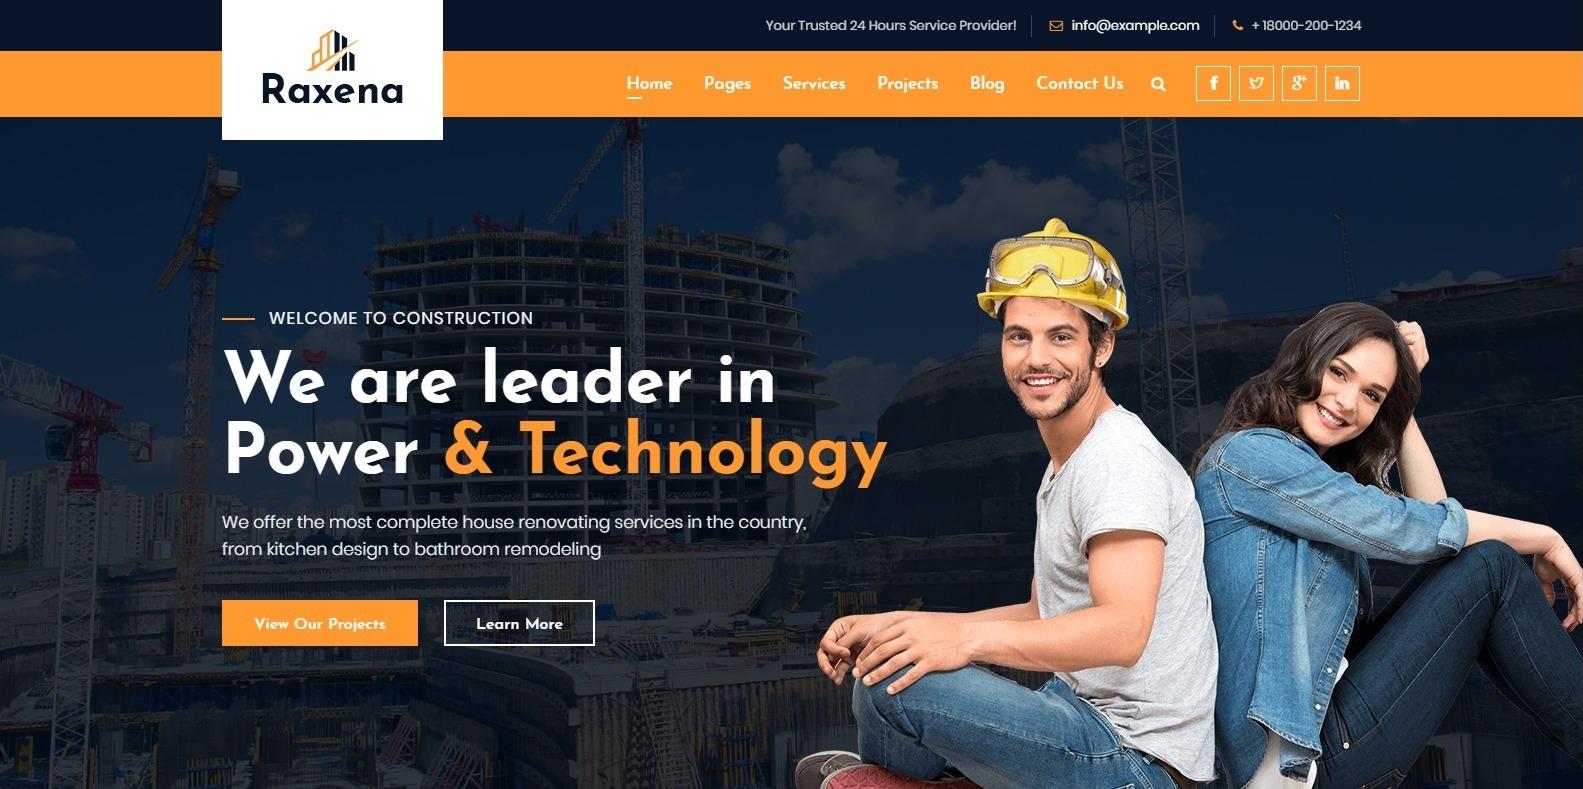 raxena-construction-website-template